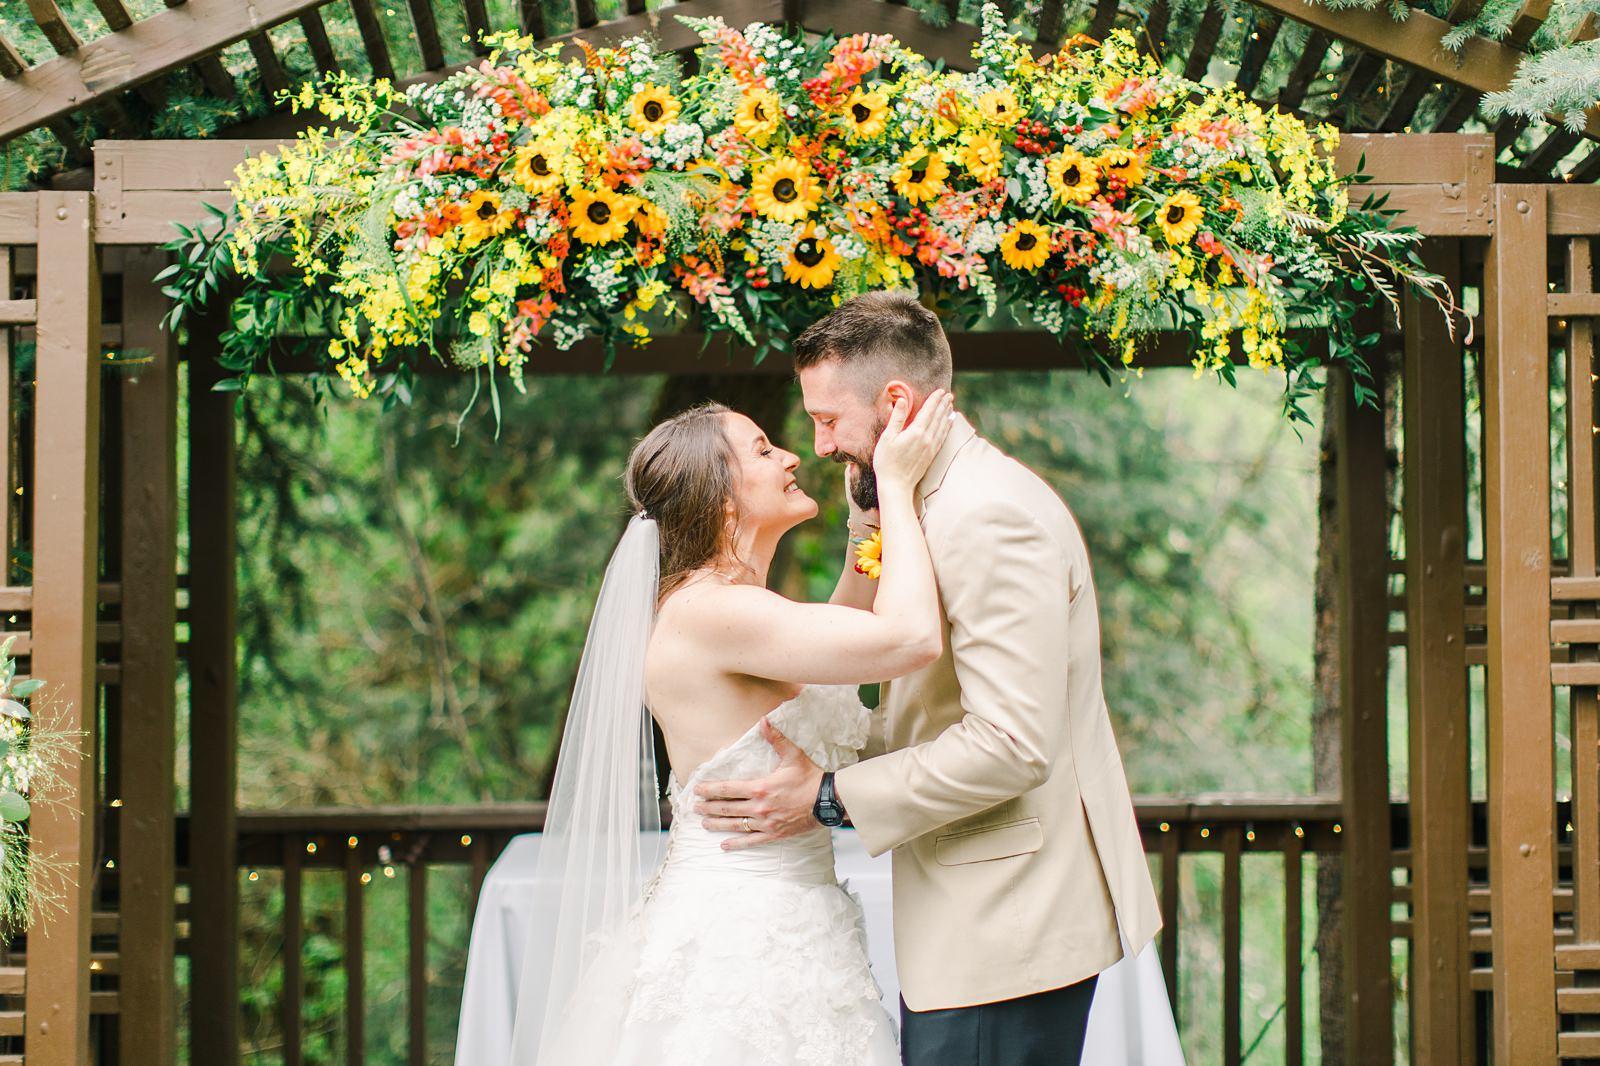 Millcreek Inn Summer Wedding, Utah wedding photography Millcreek Canyon, Salt Lake City, bride and groom kiss under sunflower wildflower arch wedding flowers decor